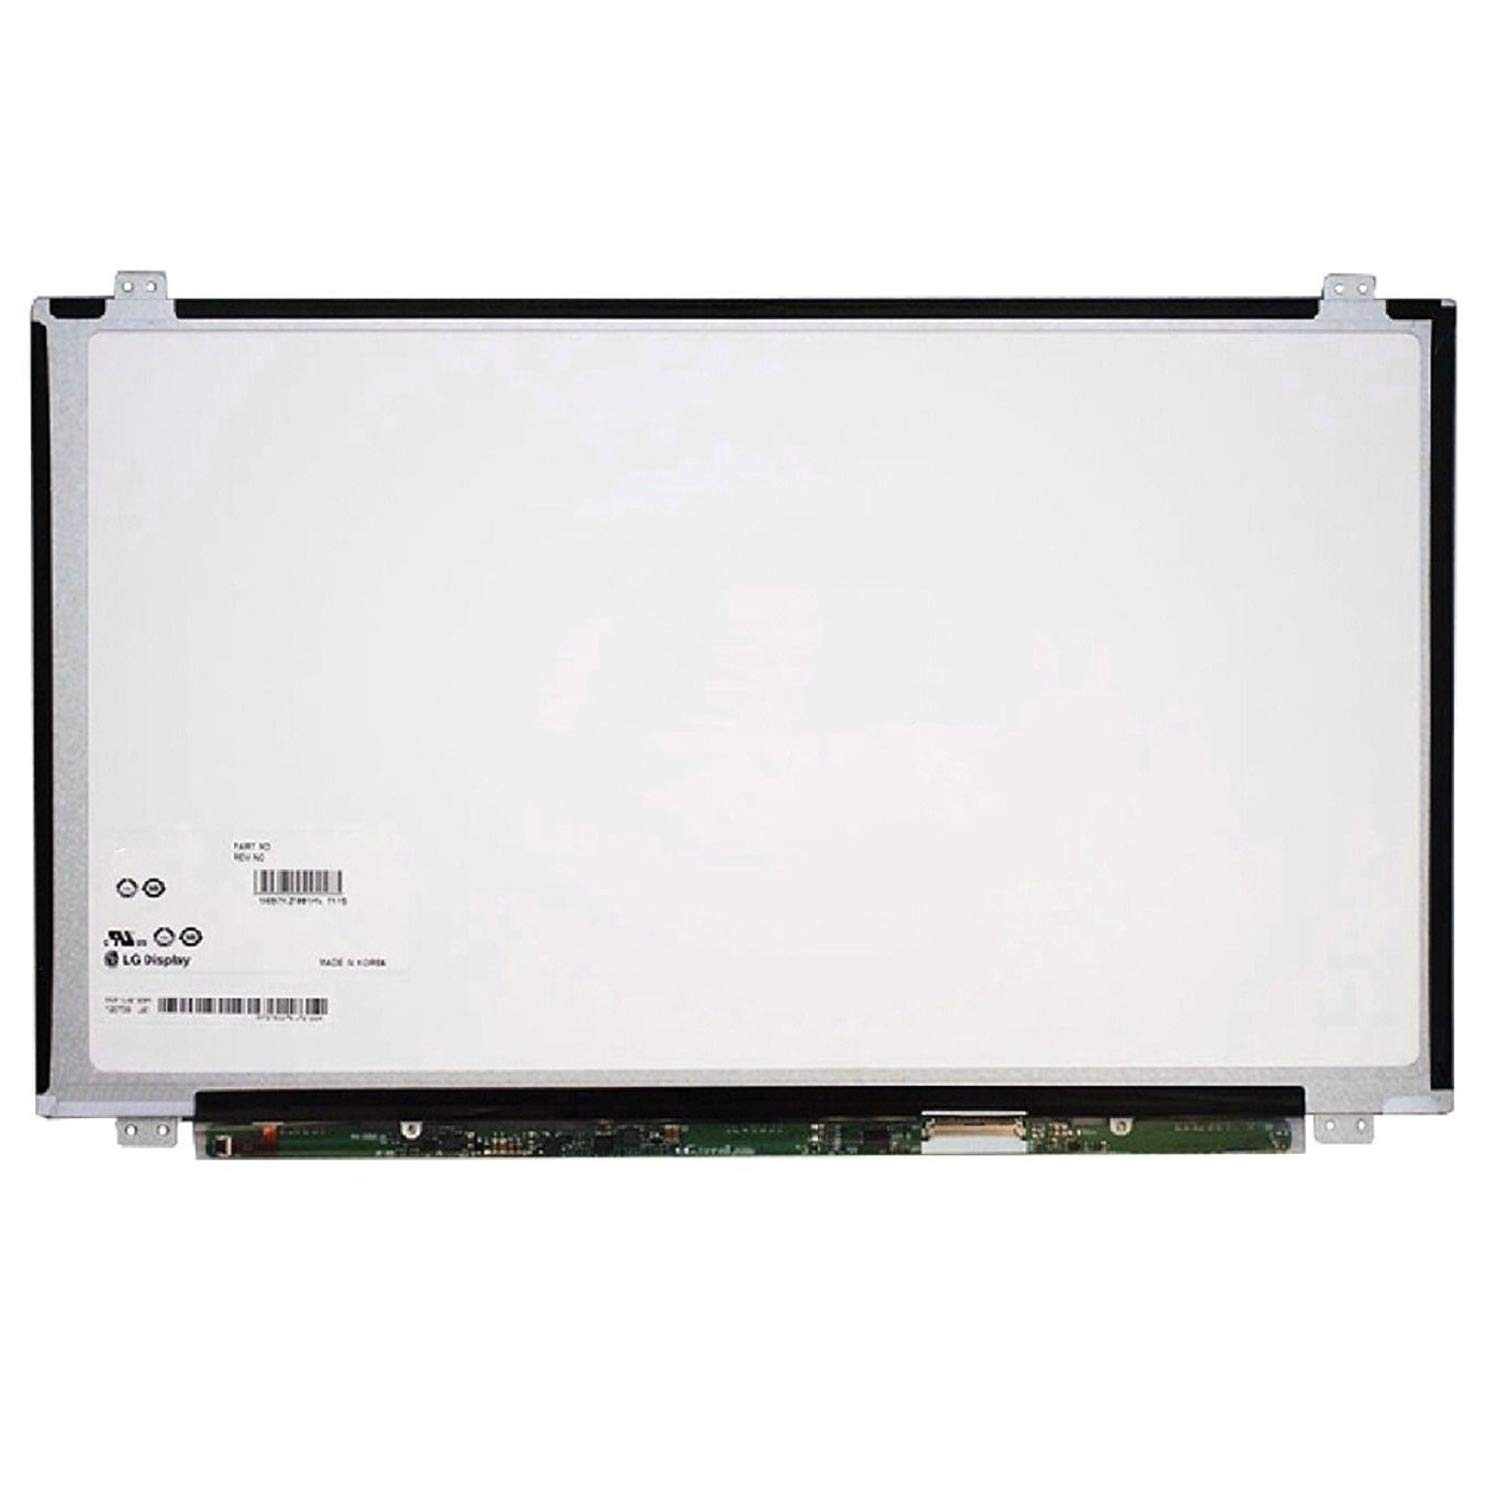 New Stone NB-1210 Laptop Screen 15.6' LED BACKLIT HD [PC] [PC]